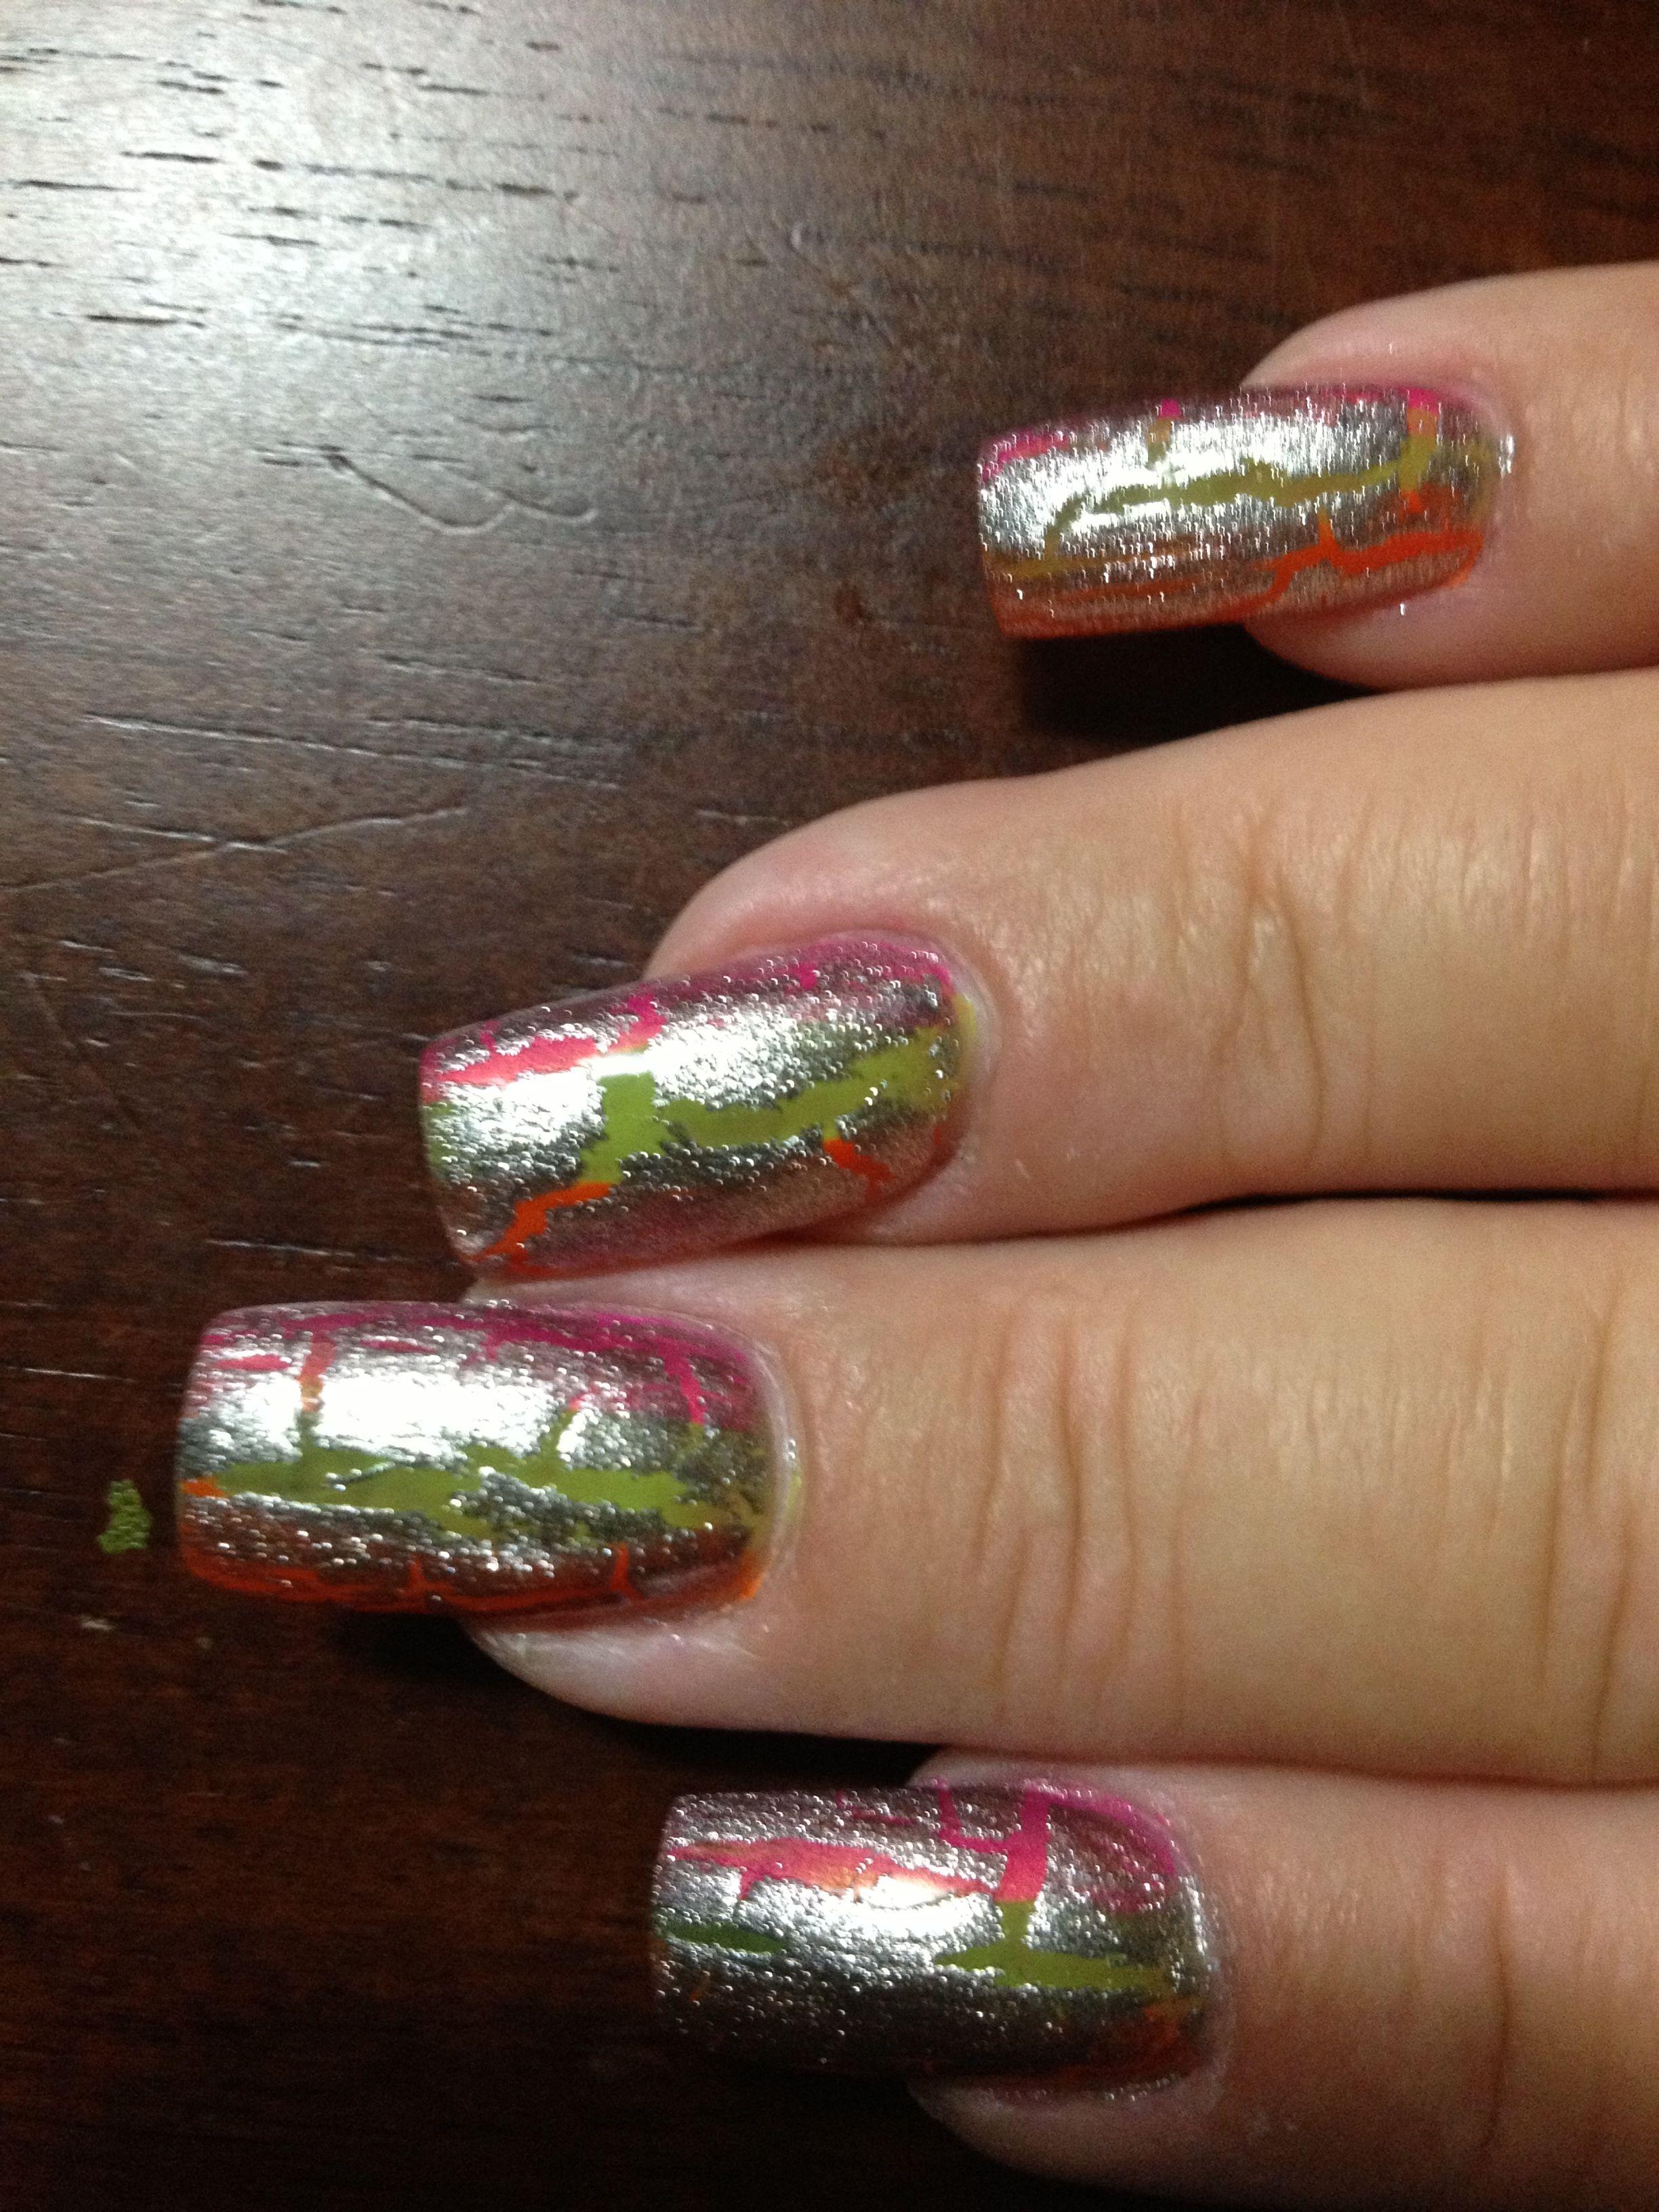 Scary nails  10/26/12